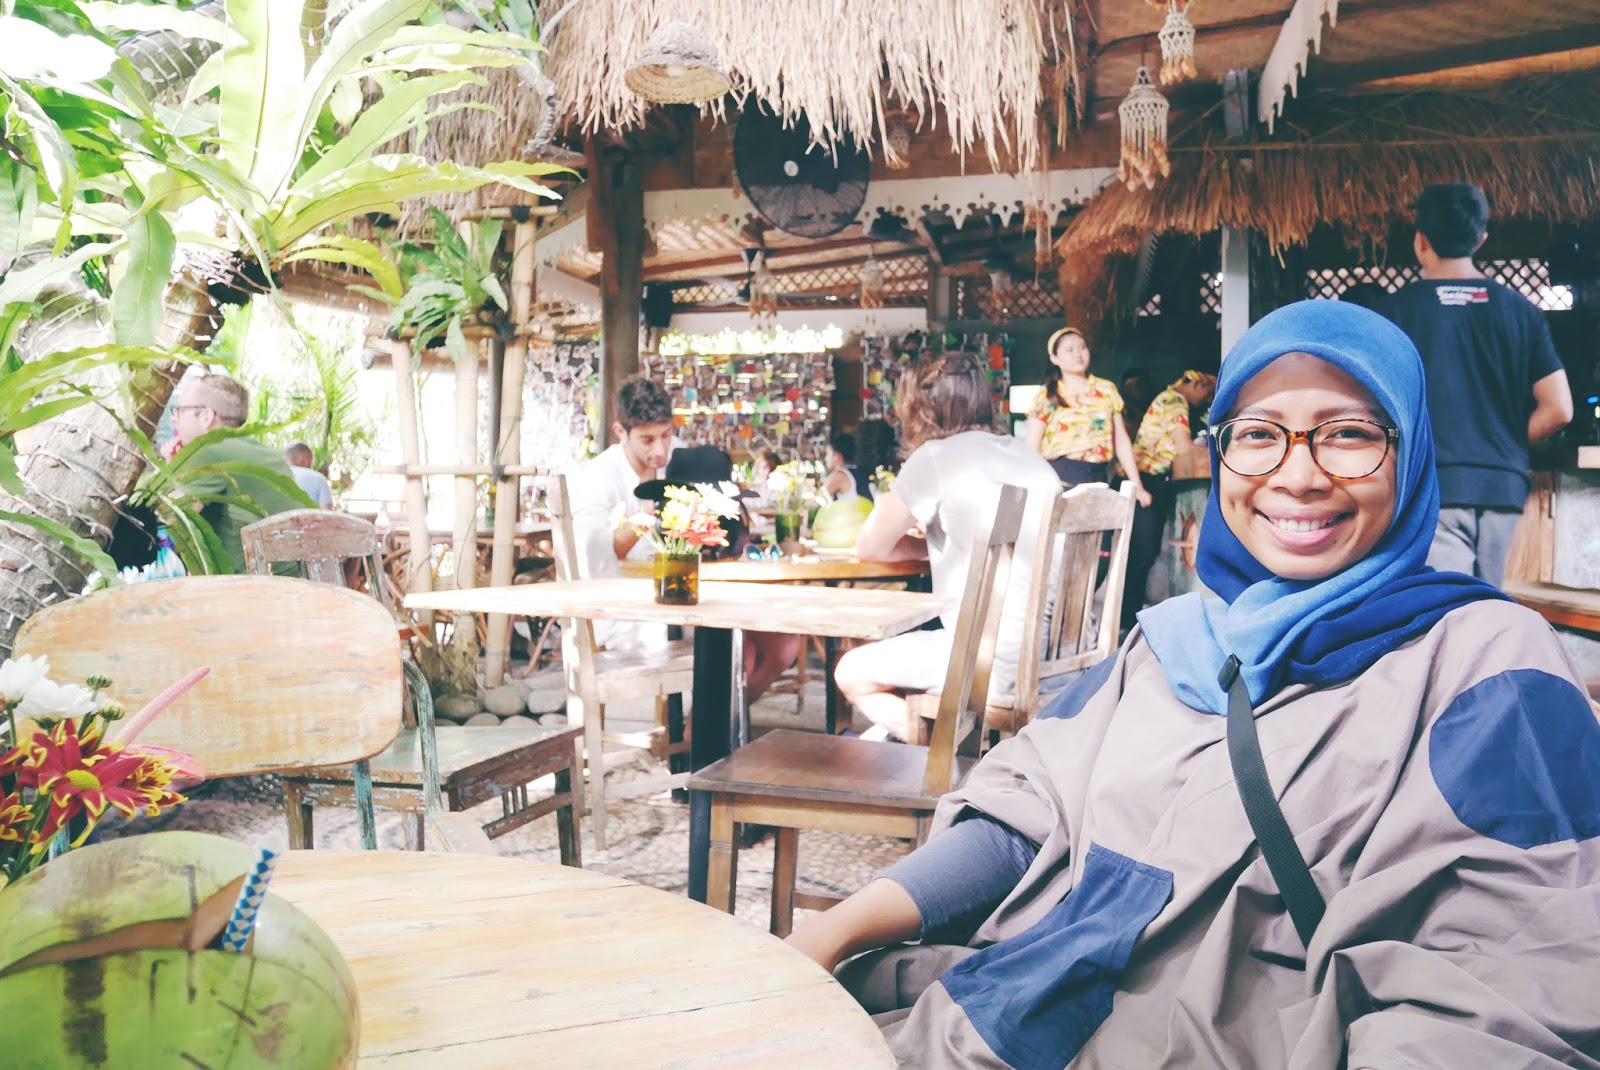 Moana Fish-Eatery, Canggu, Bali